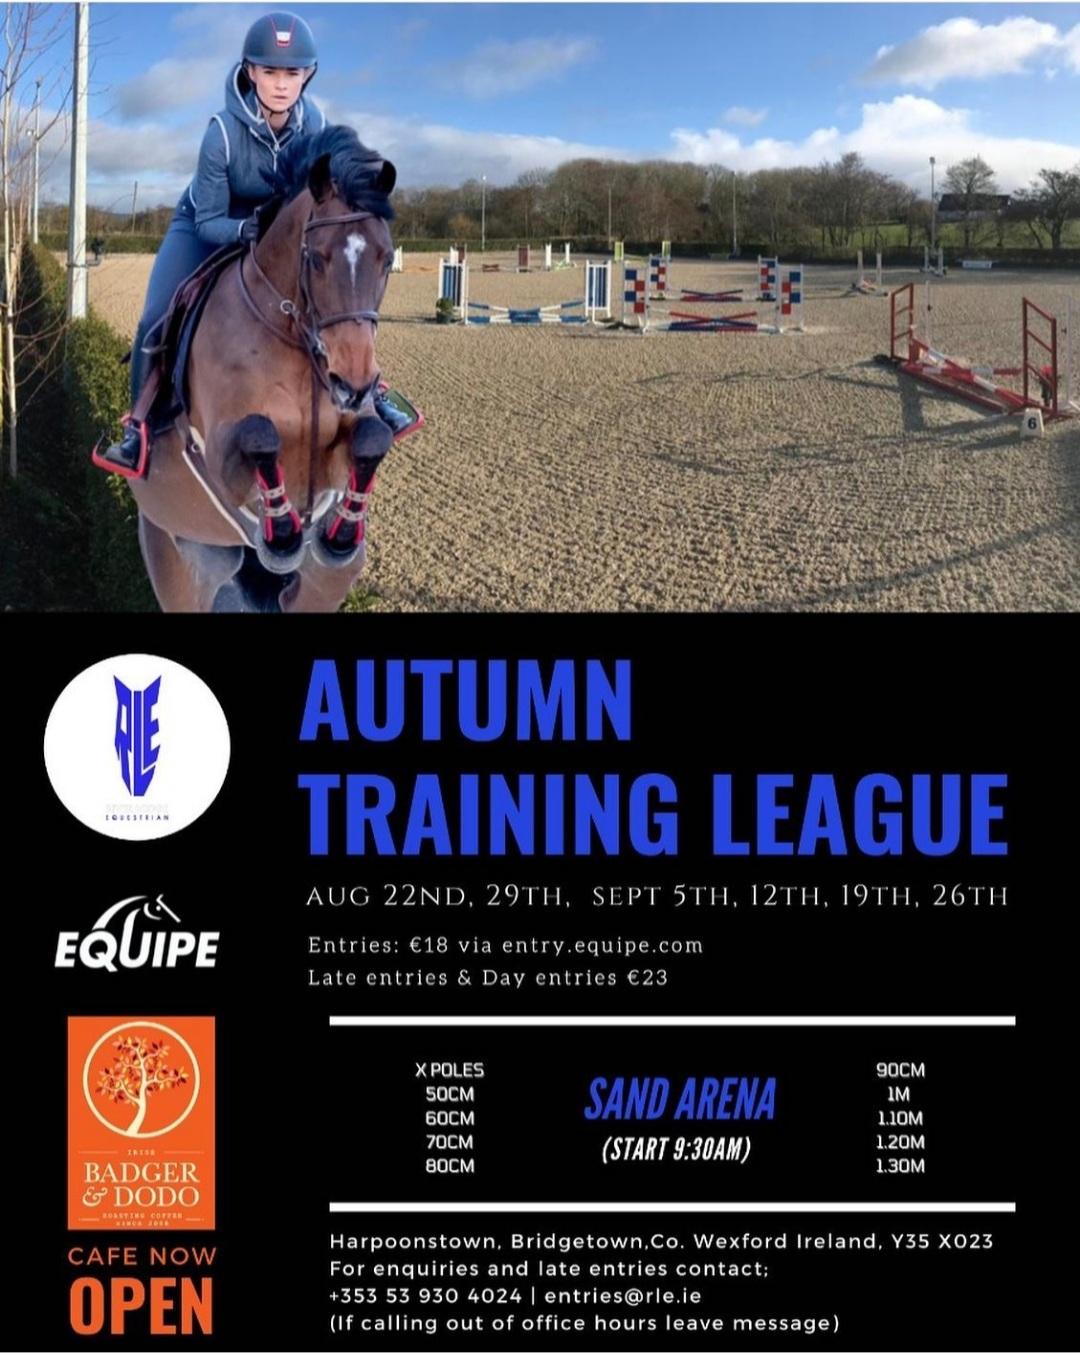 Autumn Training League